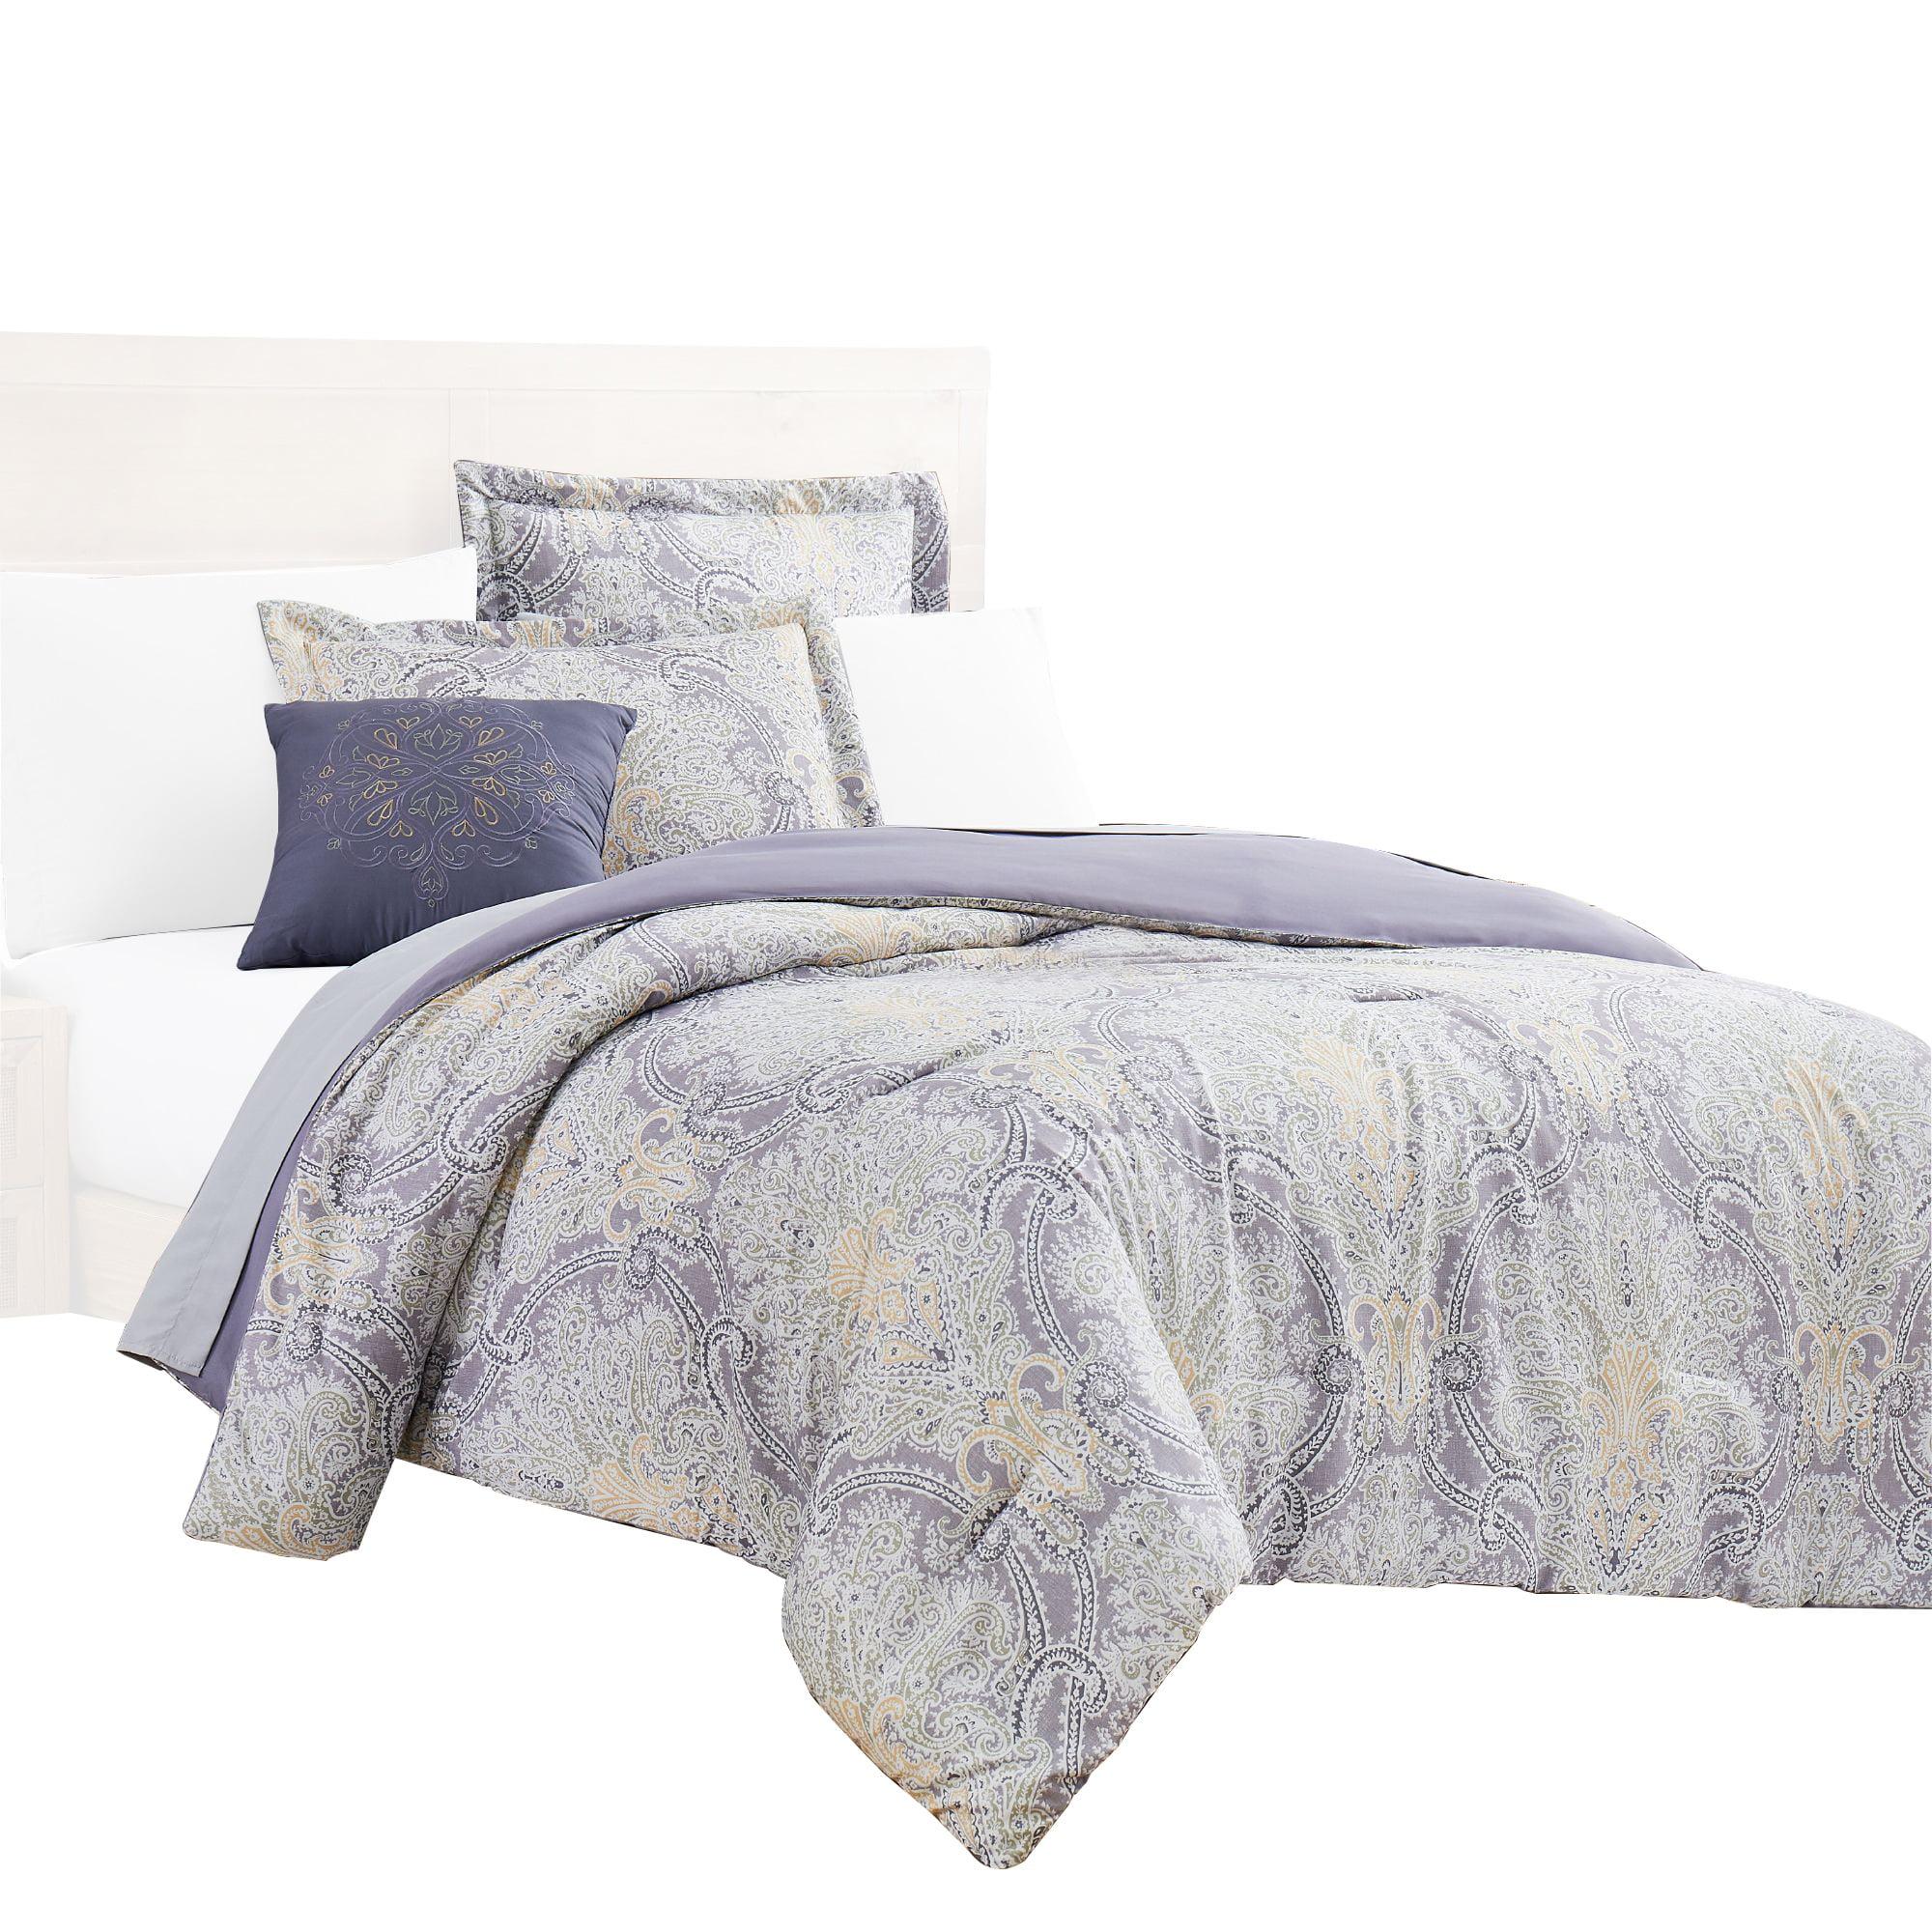 Chania 8 Piece Full Bed Set With Paisley Print The Urban Port Purple And White Walmart Com Walmart Com